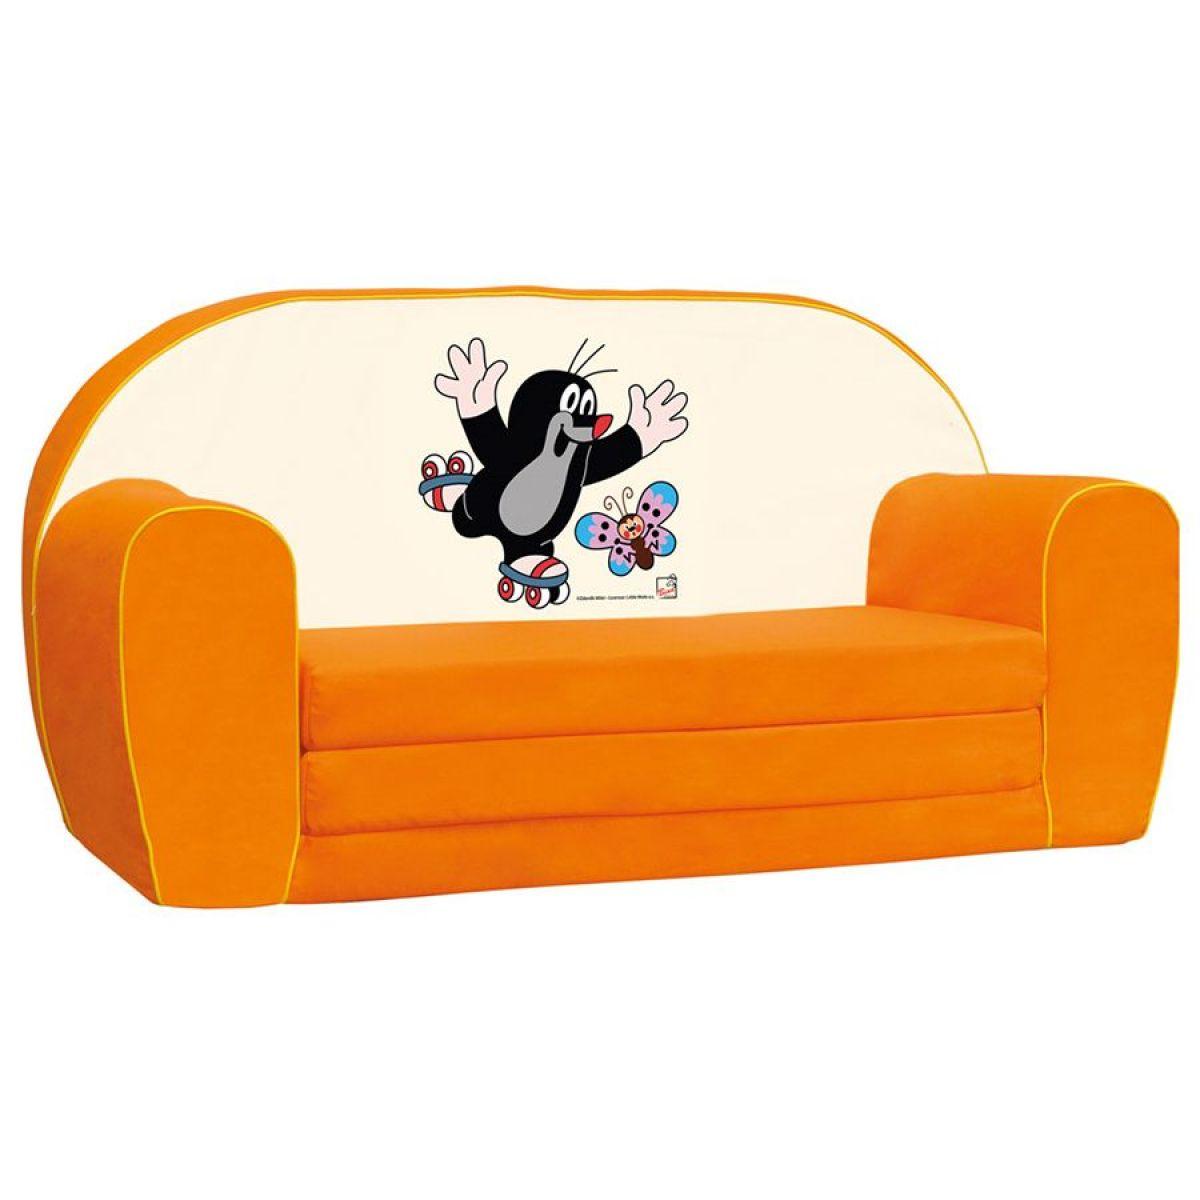 Bino Krteček mini pohovka oranžová